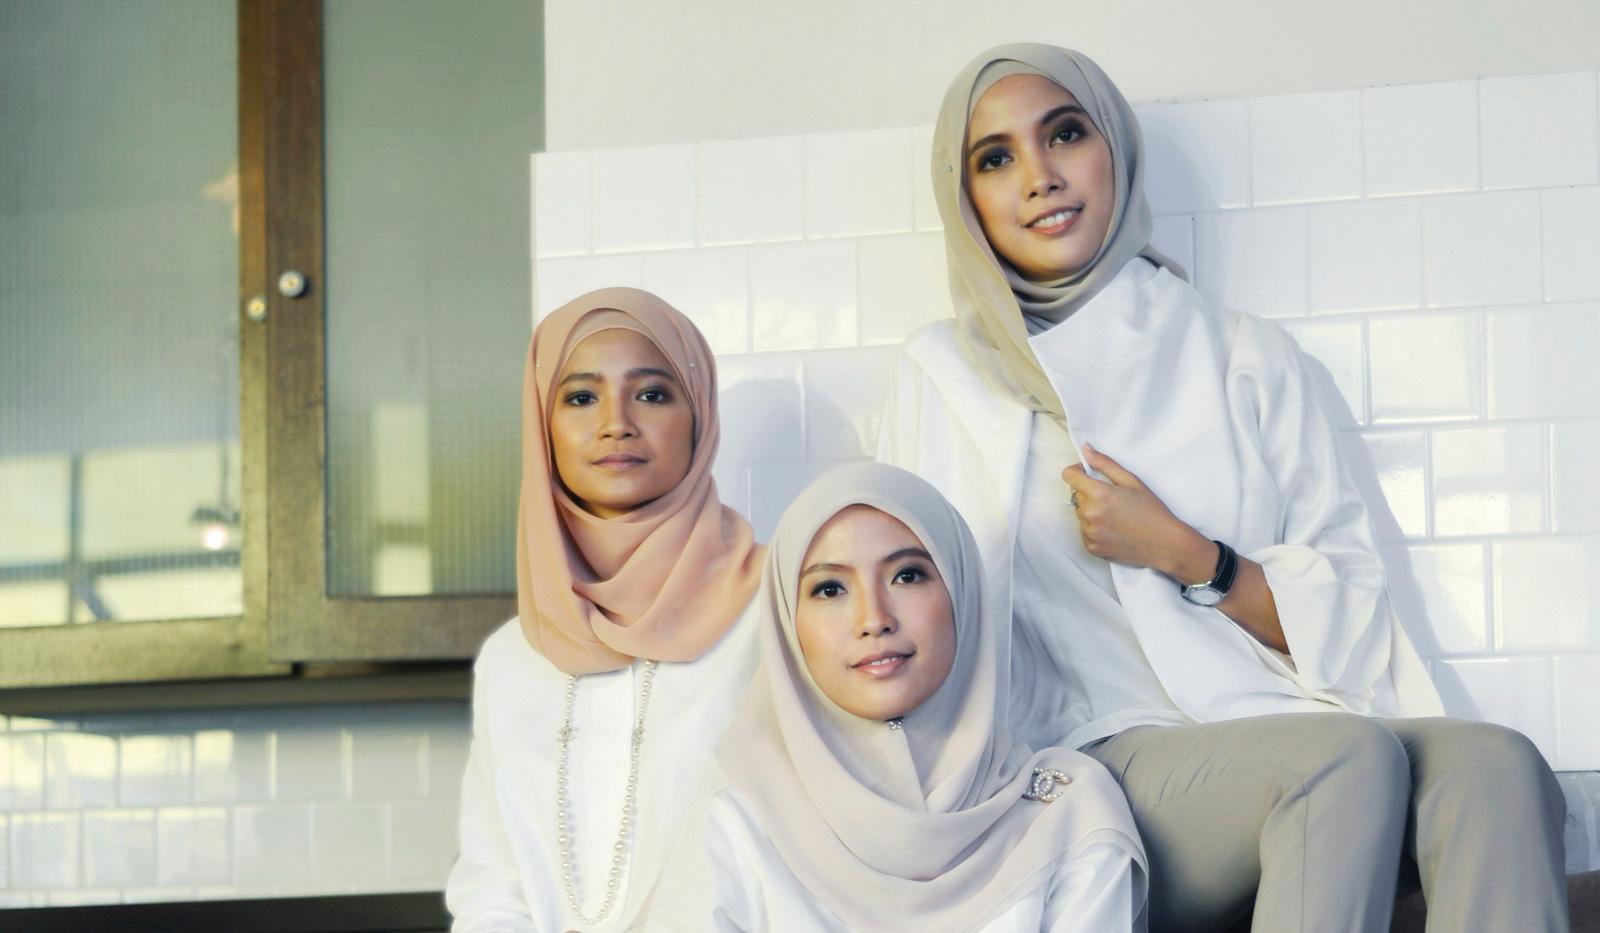 The Zulkifli sisters, who co-founded Malaysian fashion house Mimpikita